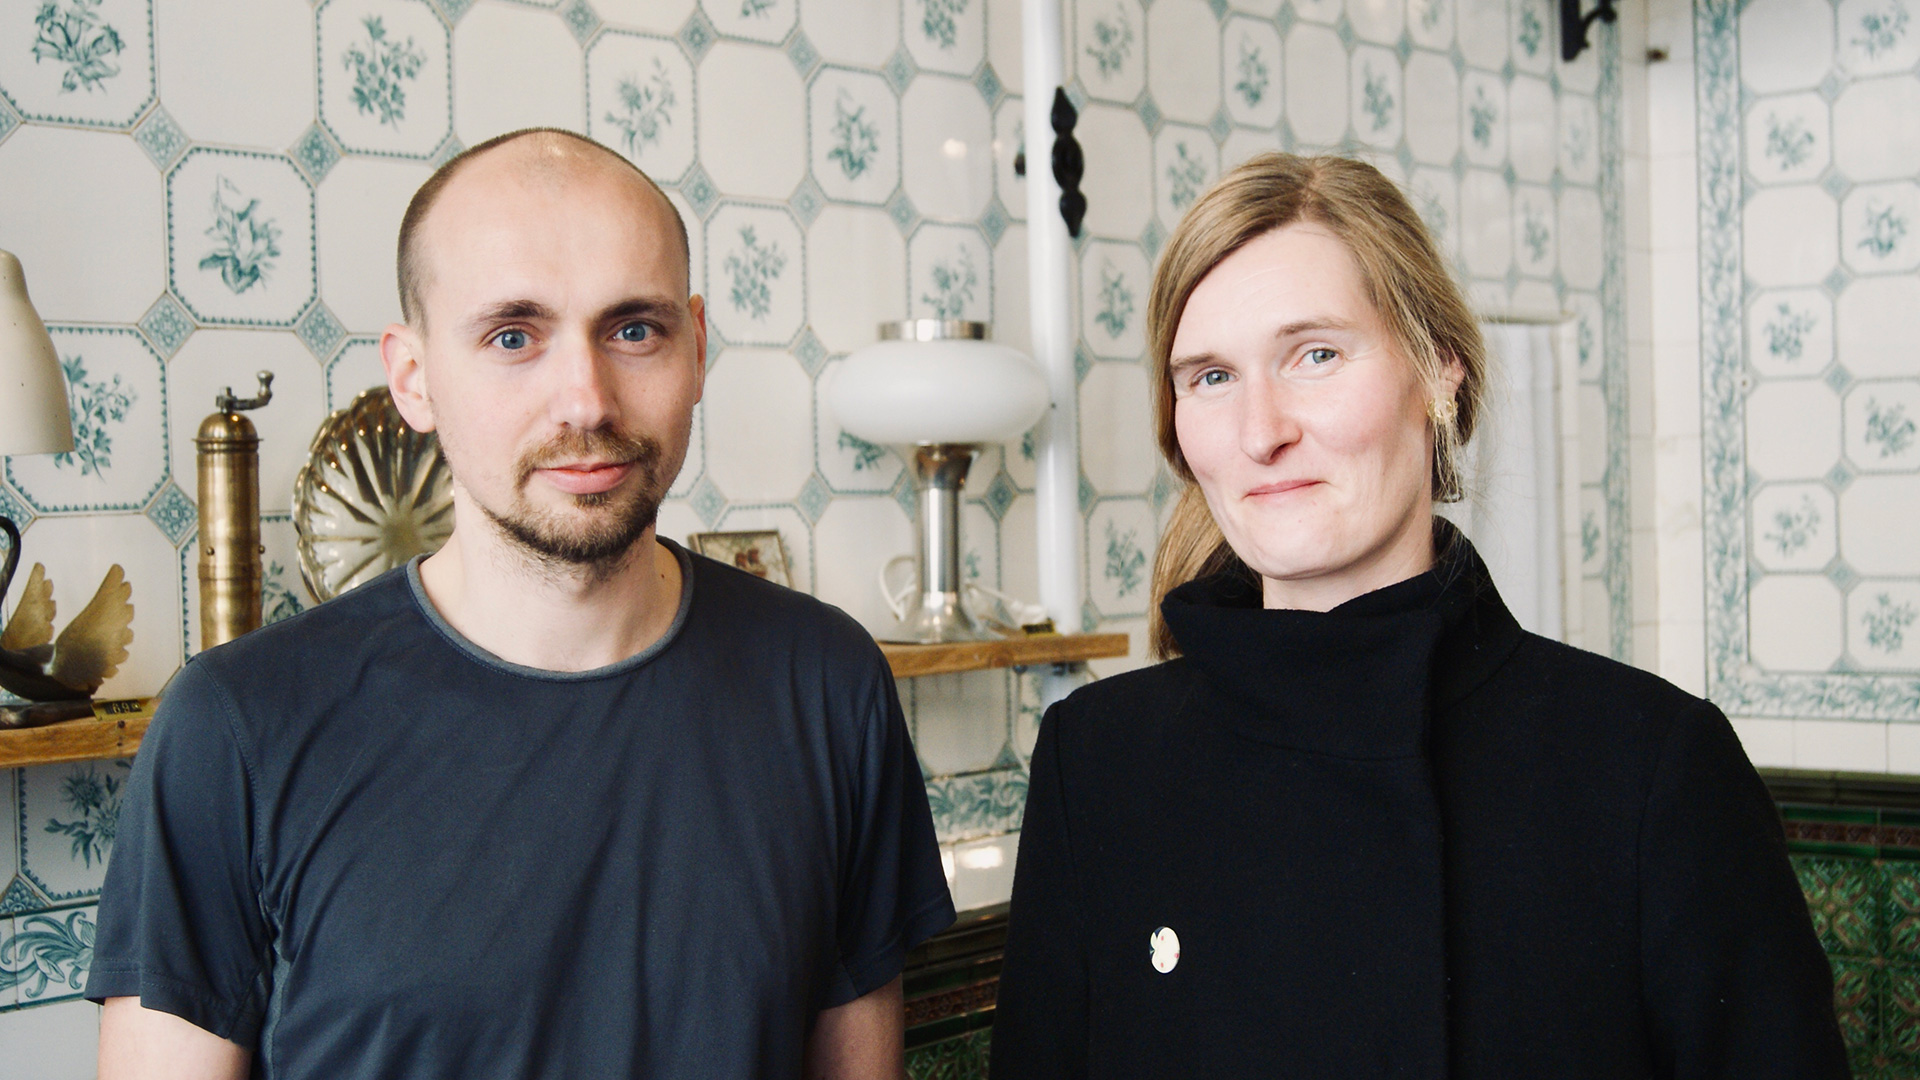 Paul Altmann & Antje Schaper